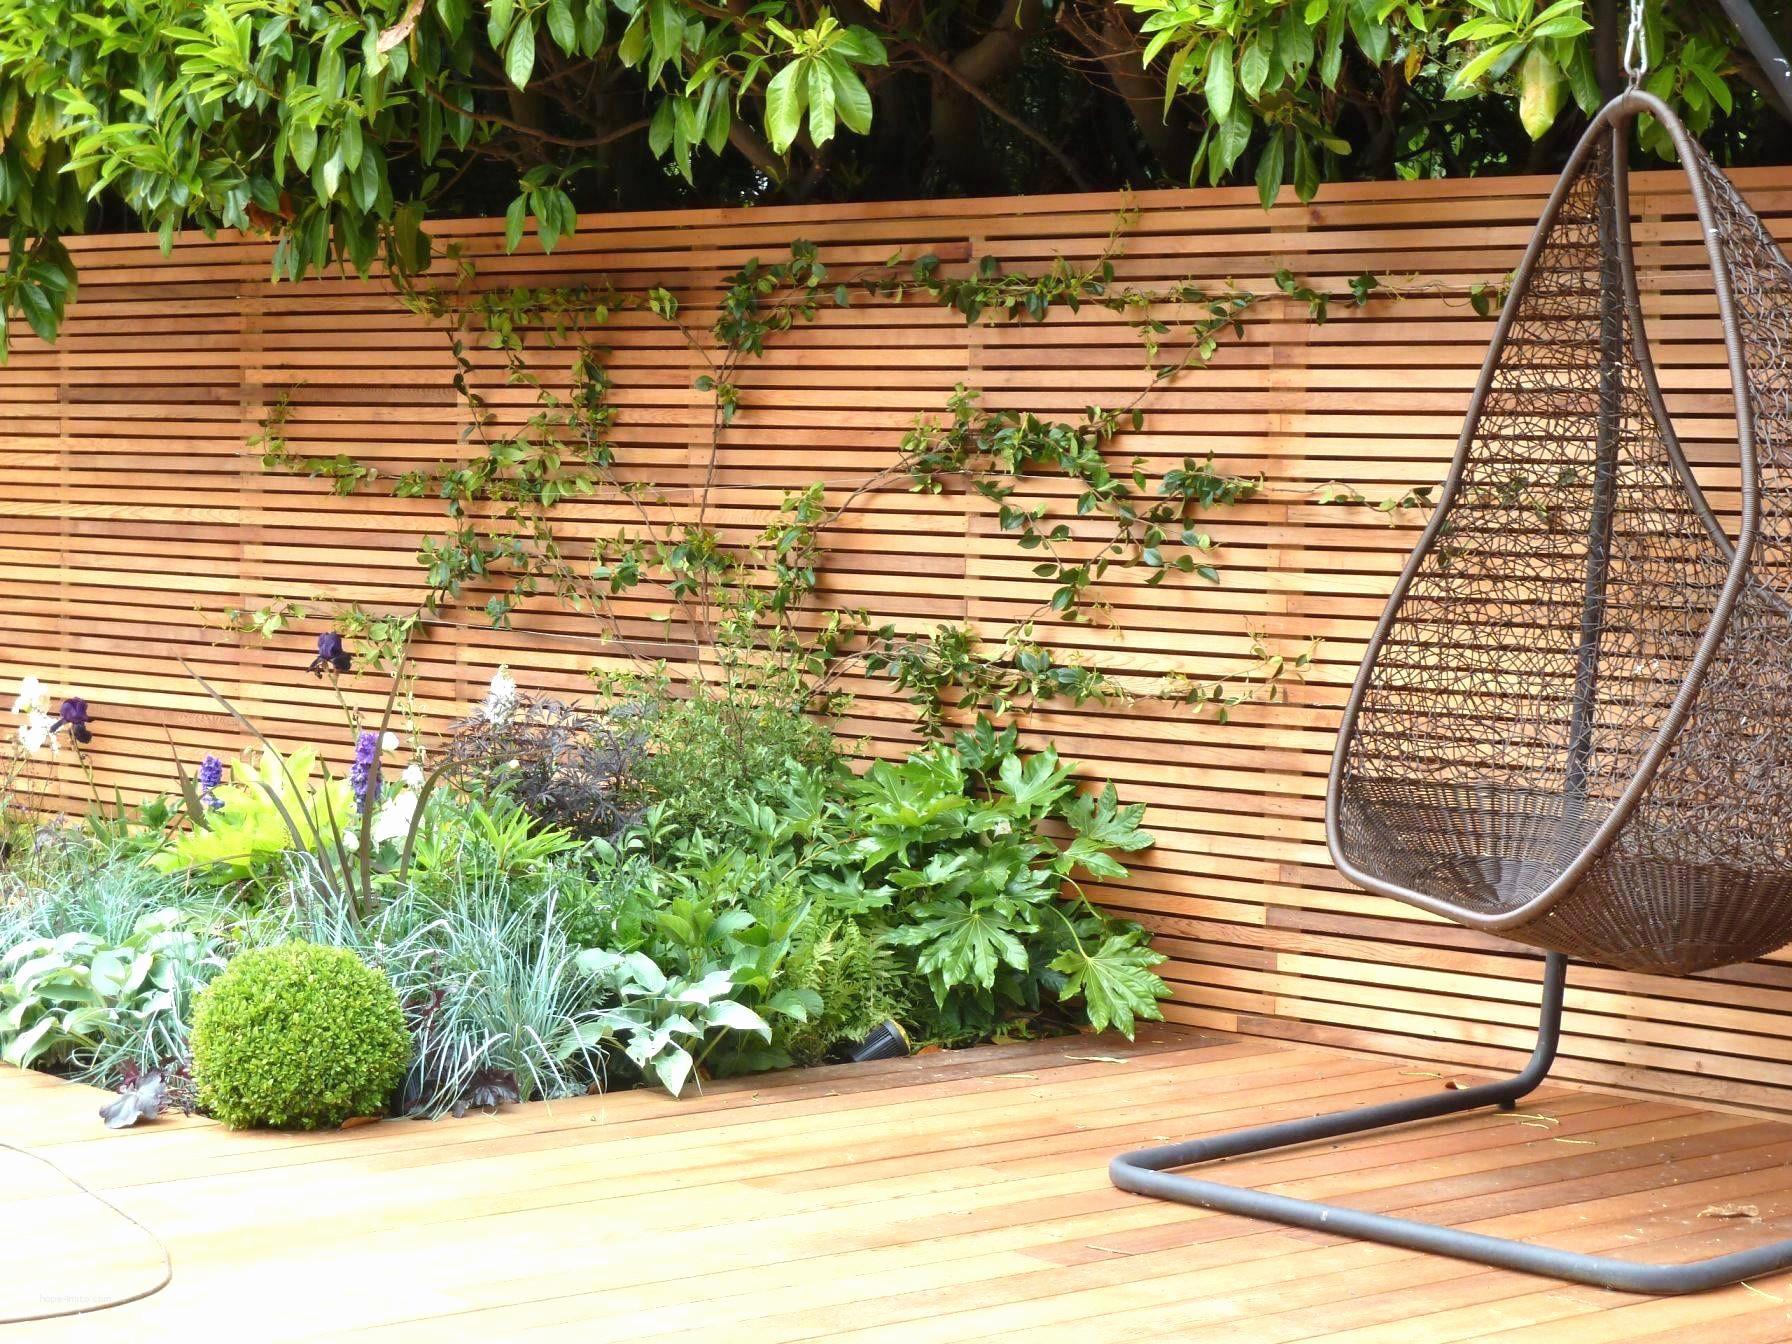 28 Einzigartig Balkon Gestalten Ideen Garten Deko